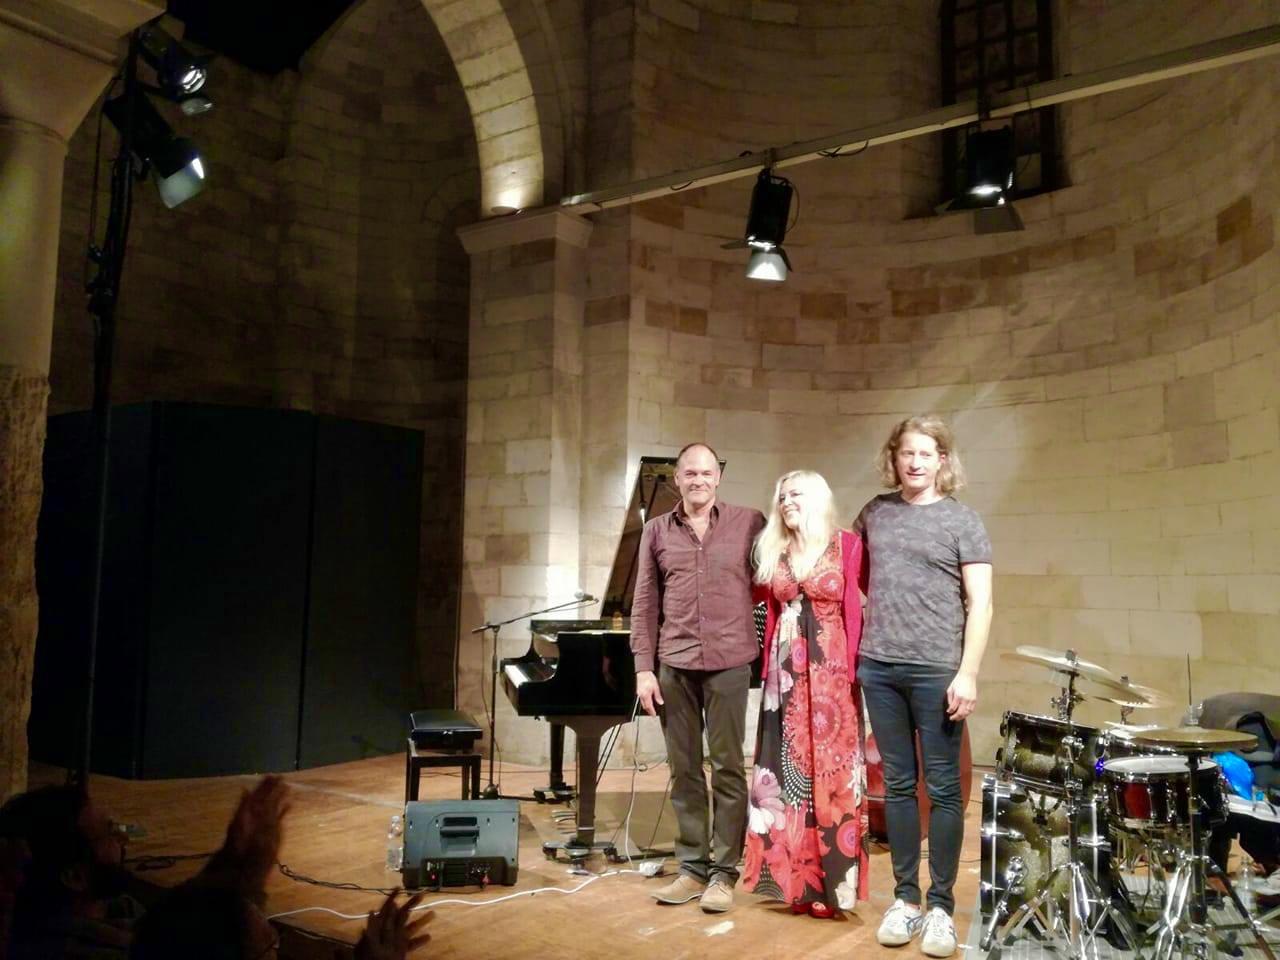 Anke Helfrich Trio: Dietmar Fuhr (b), Anke Helfrich (p), Jens Düppe (dr)